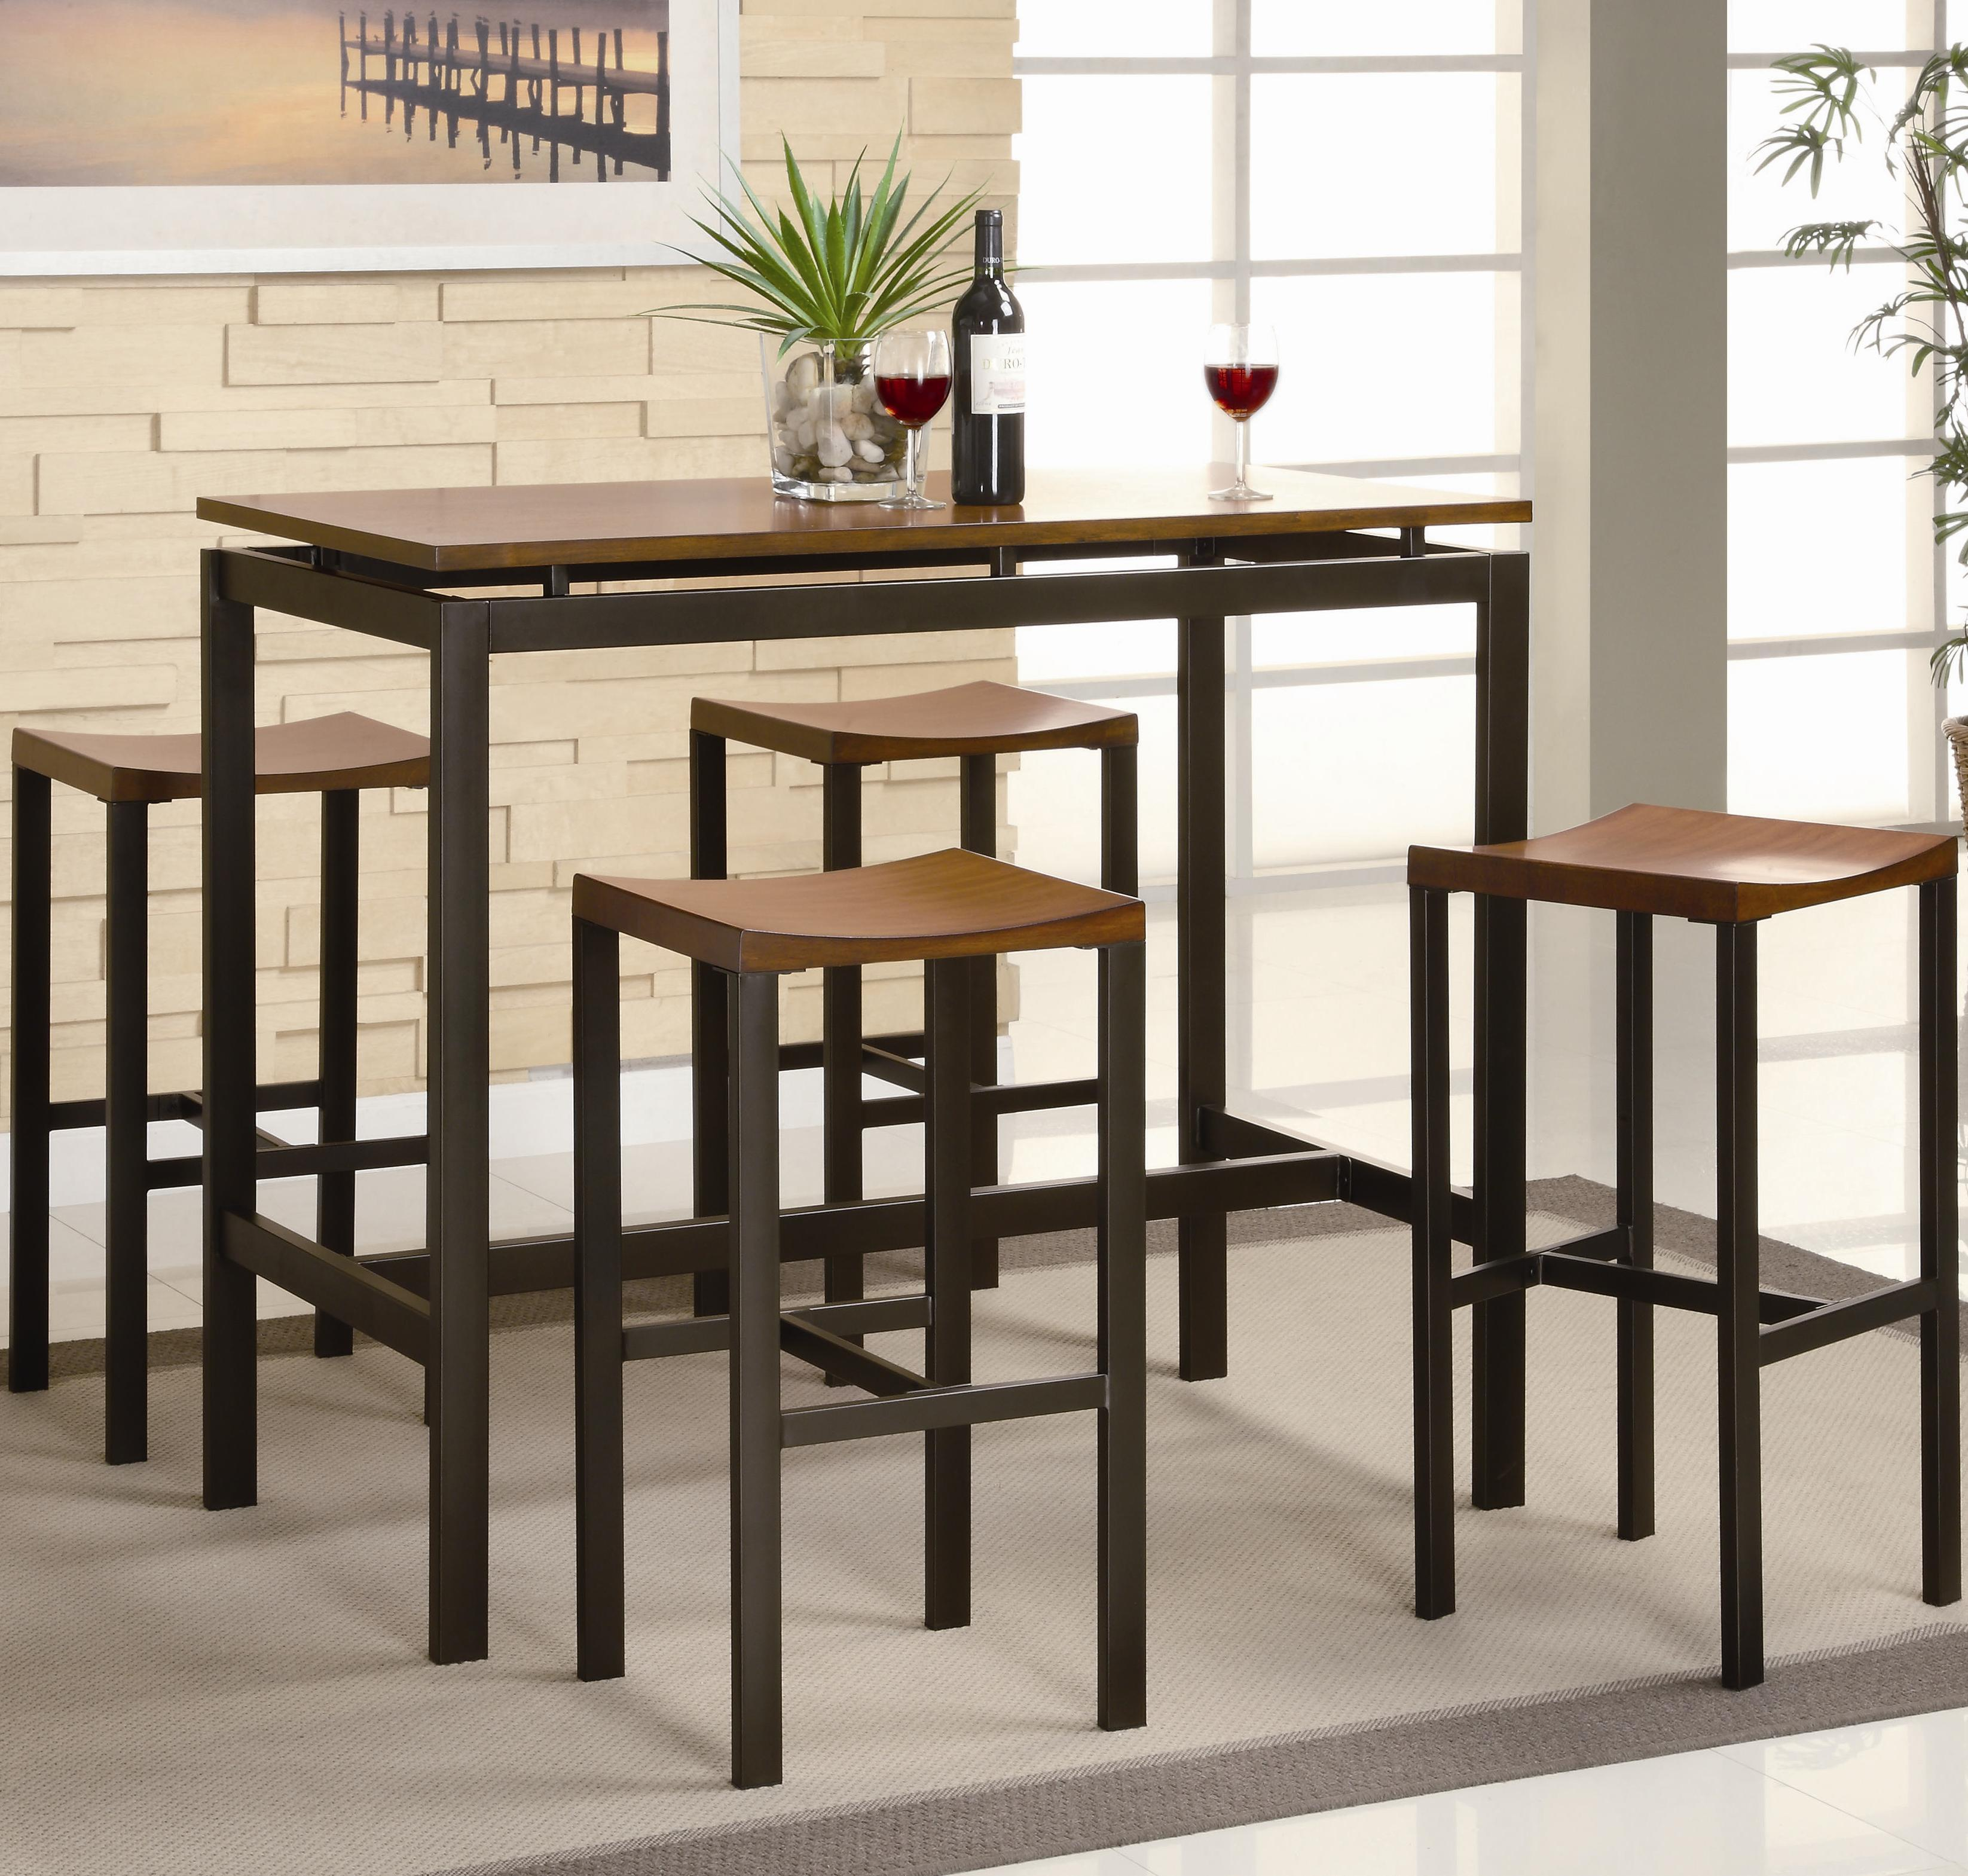 Coaster Atlus 150097 5 Piece Counter Height Dining Set